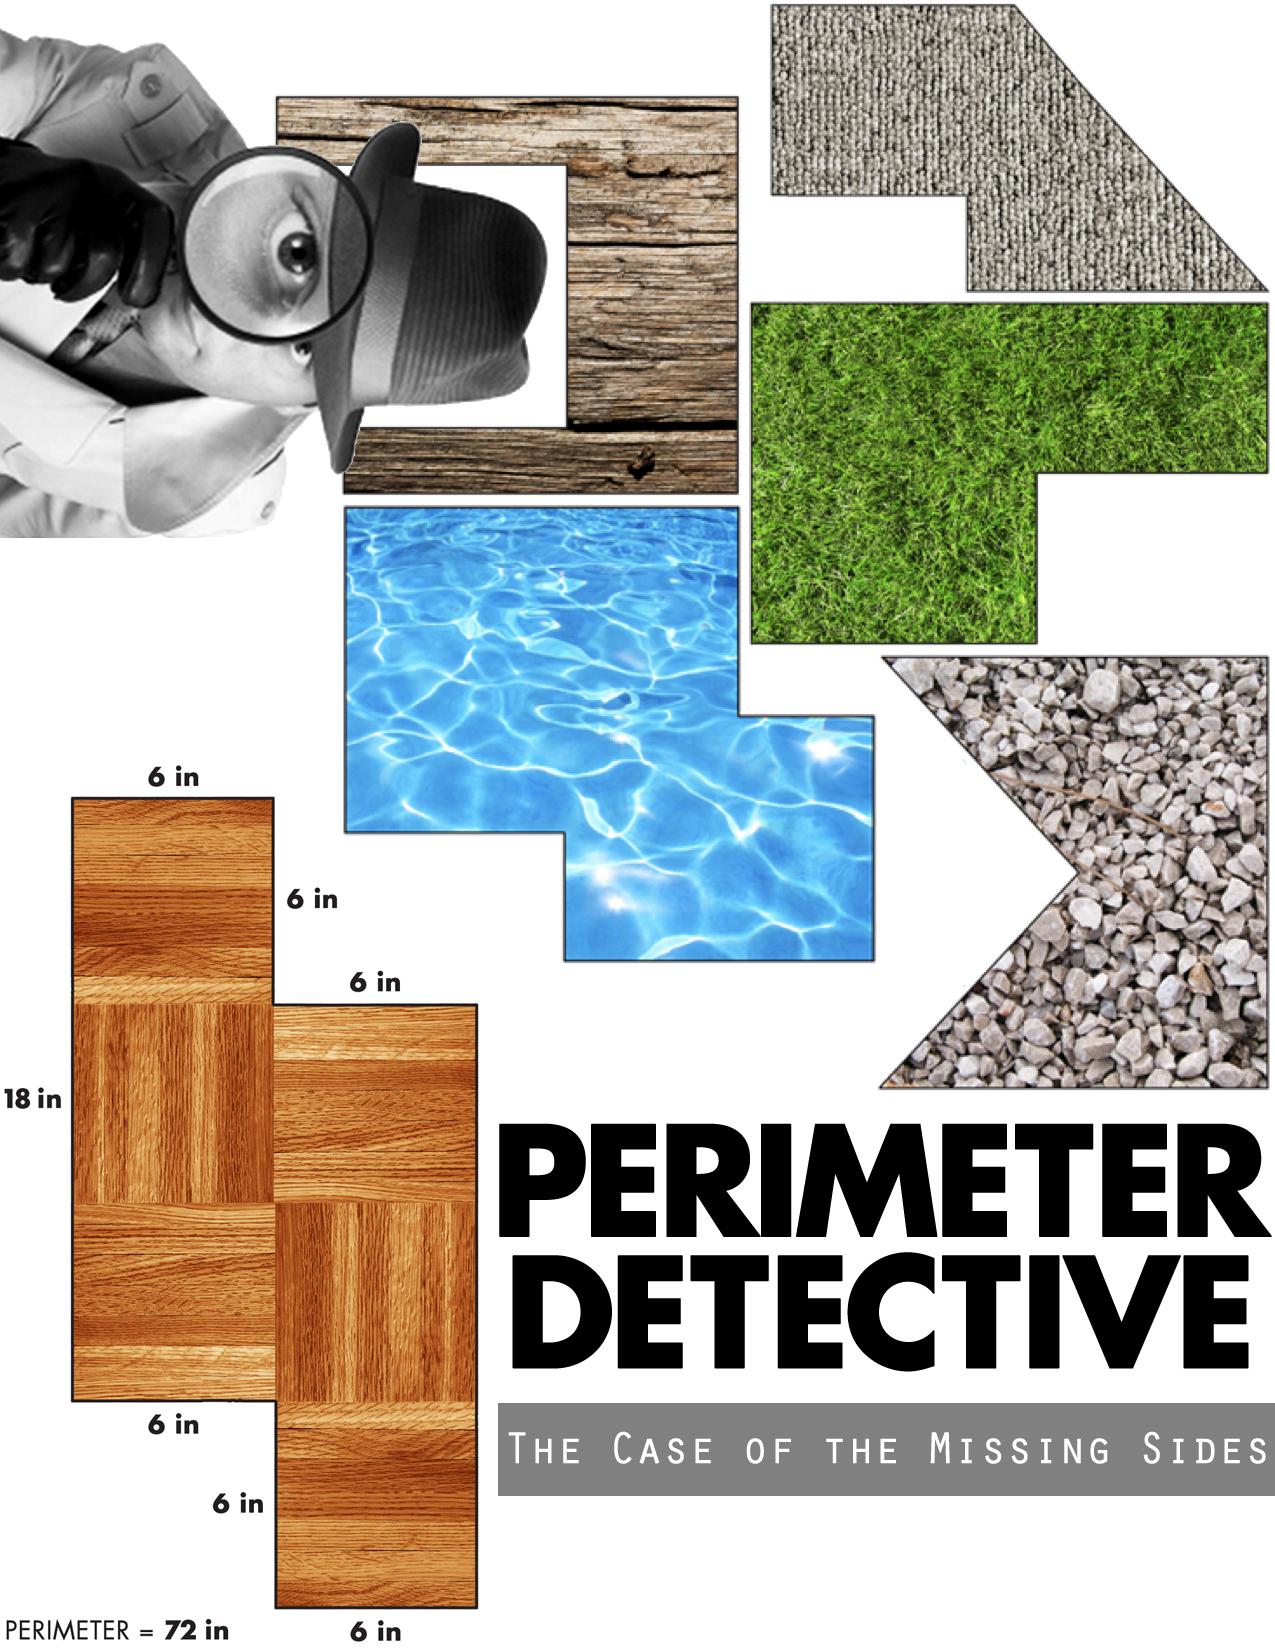 Perimeter Missing Side Worksheet   Printable Worksheets and Activities for  Teachers [ 1650 x 1275 Pixel ]